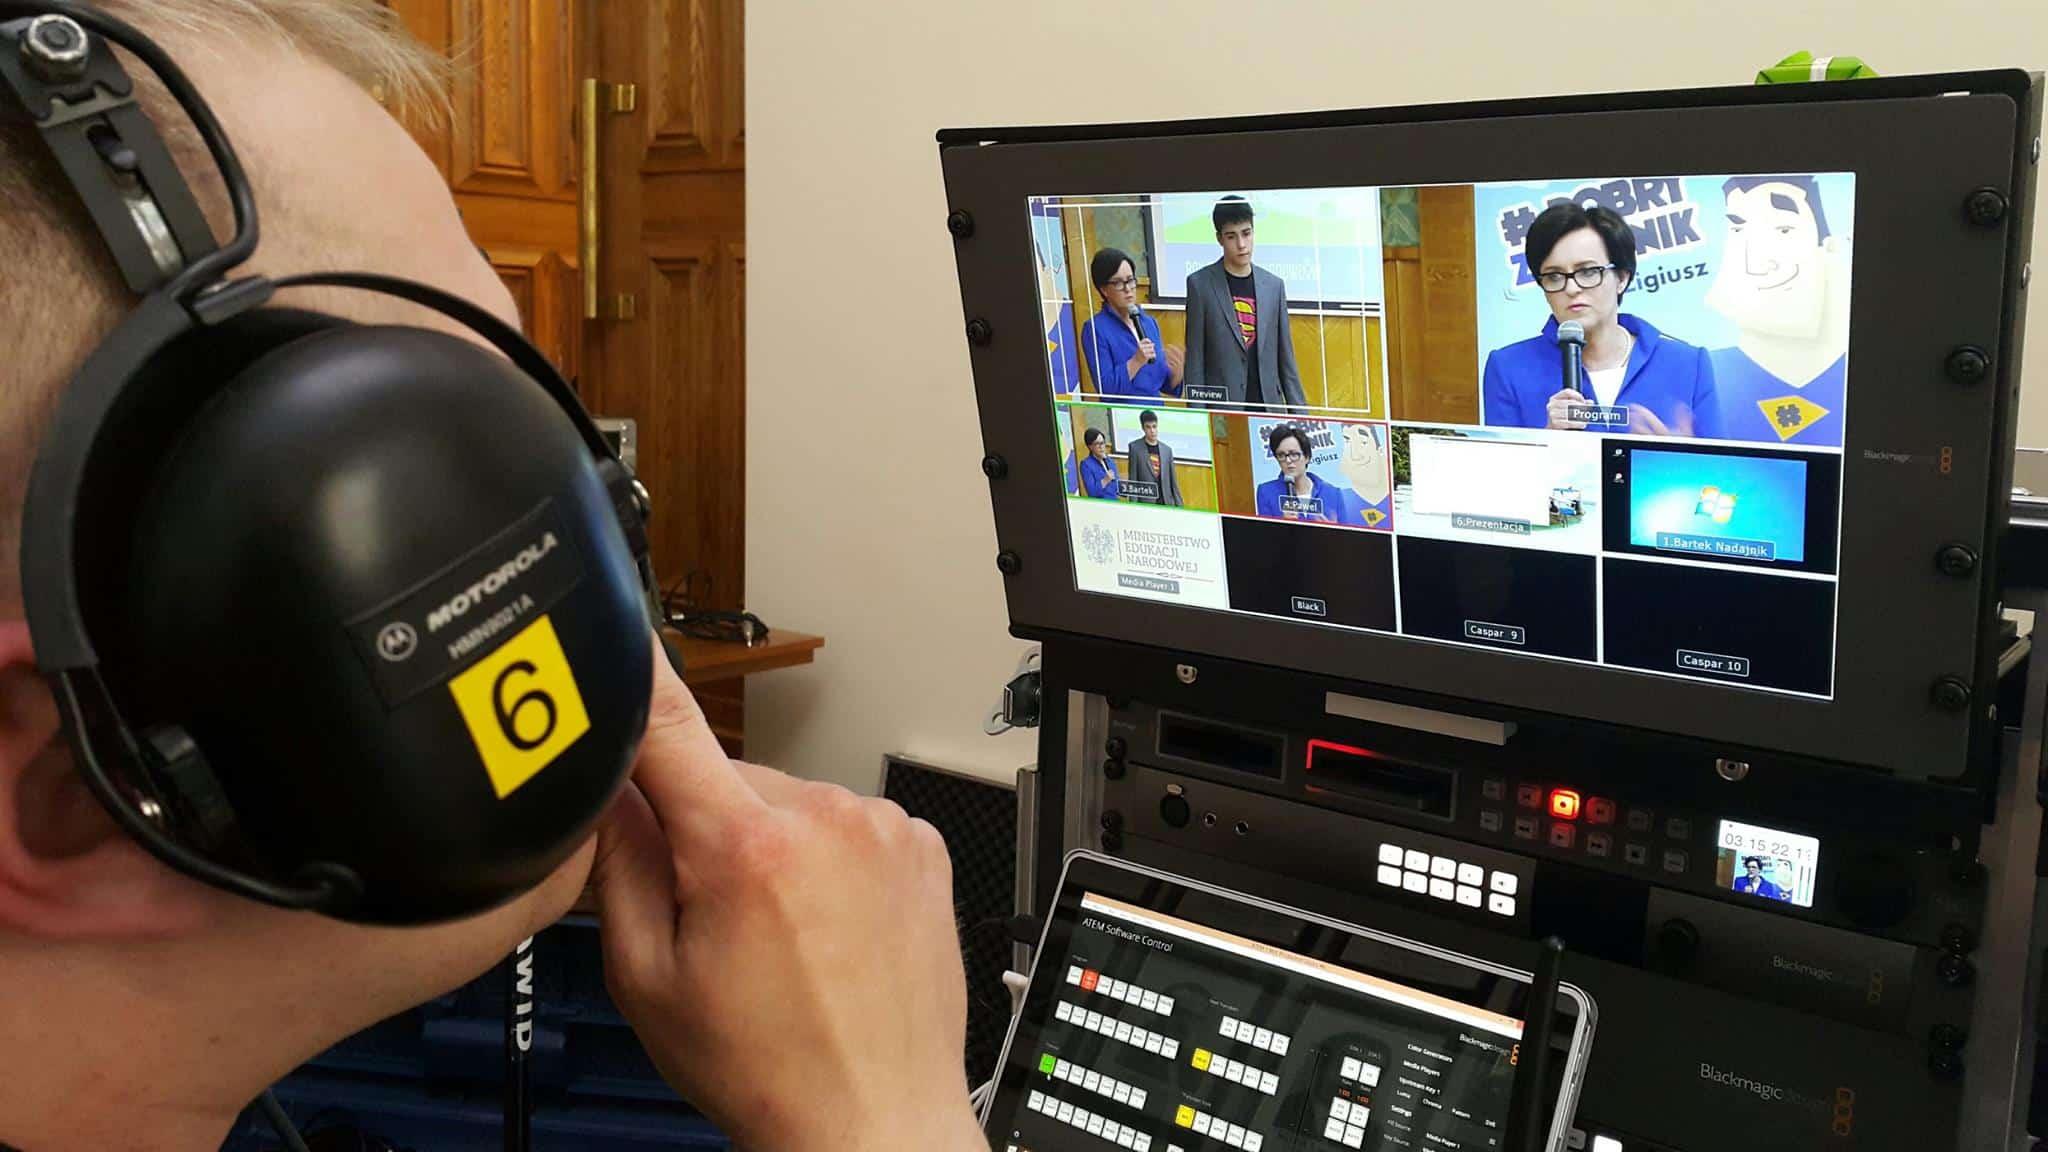 streaming-konferencje-prasowe-mikser